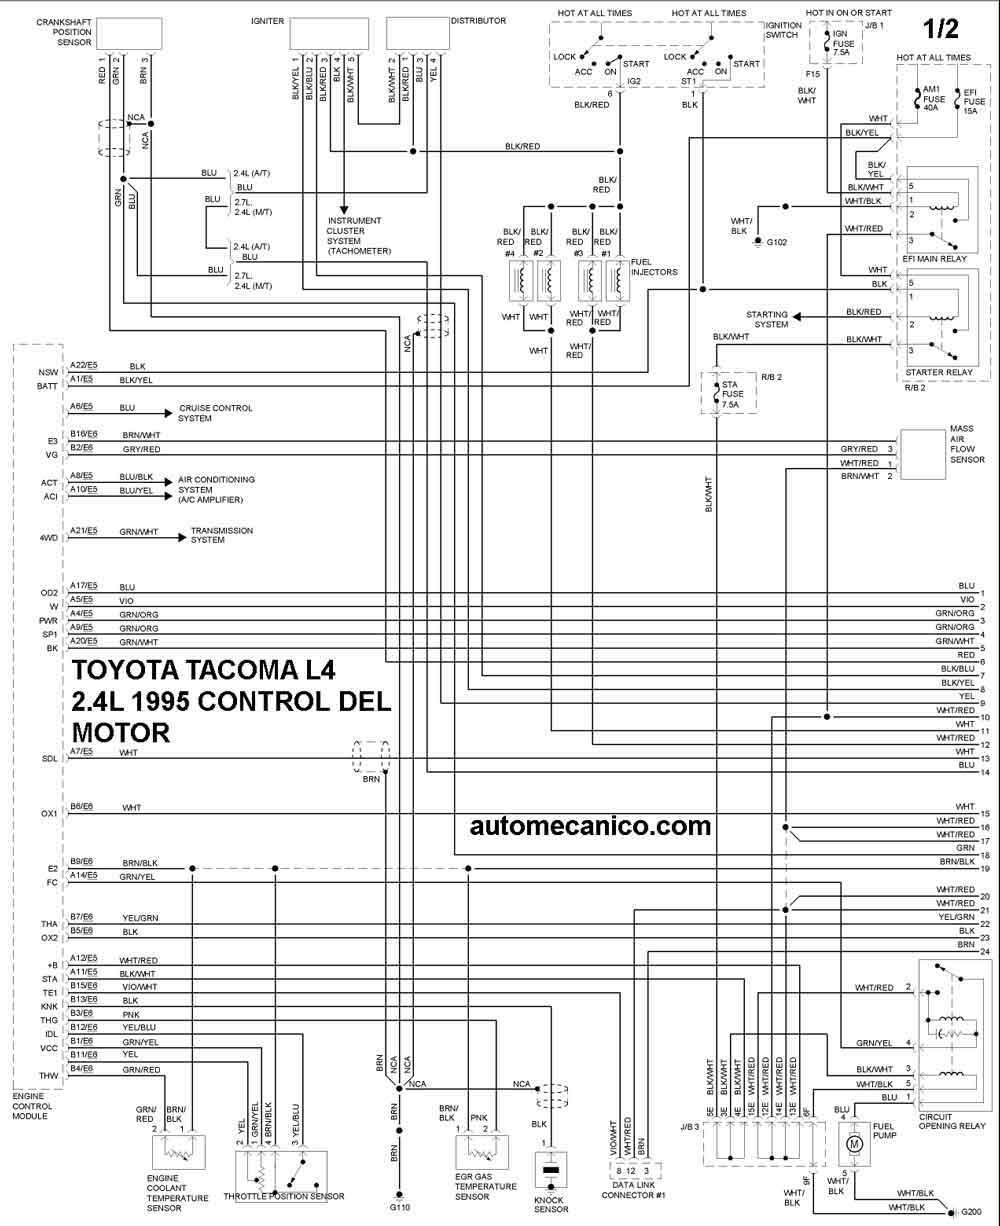 toyota 1995 - diagramas control del motor - graphics - esquemas